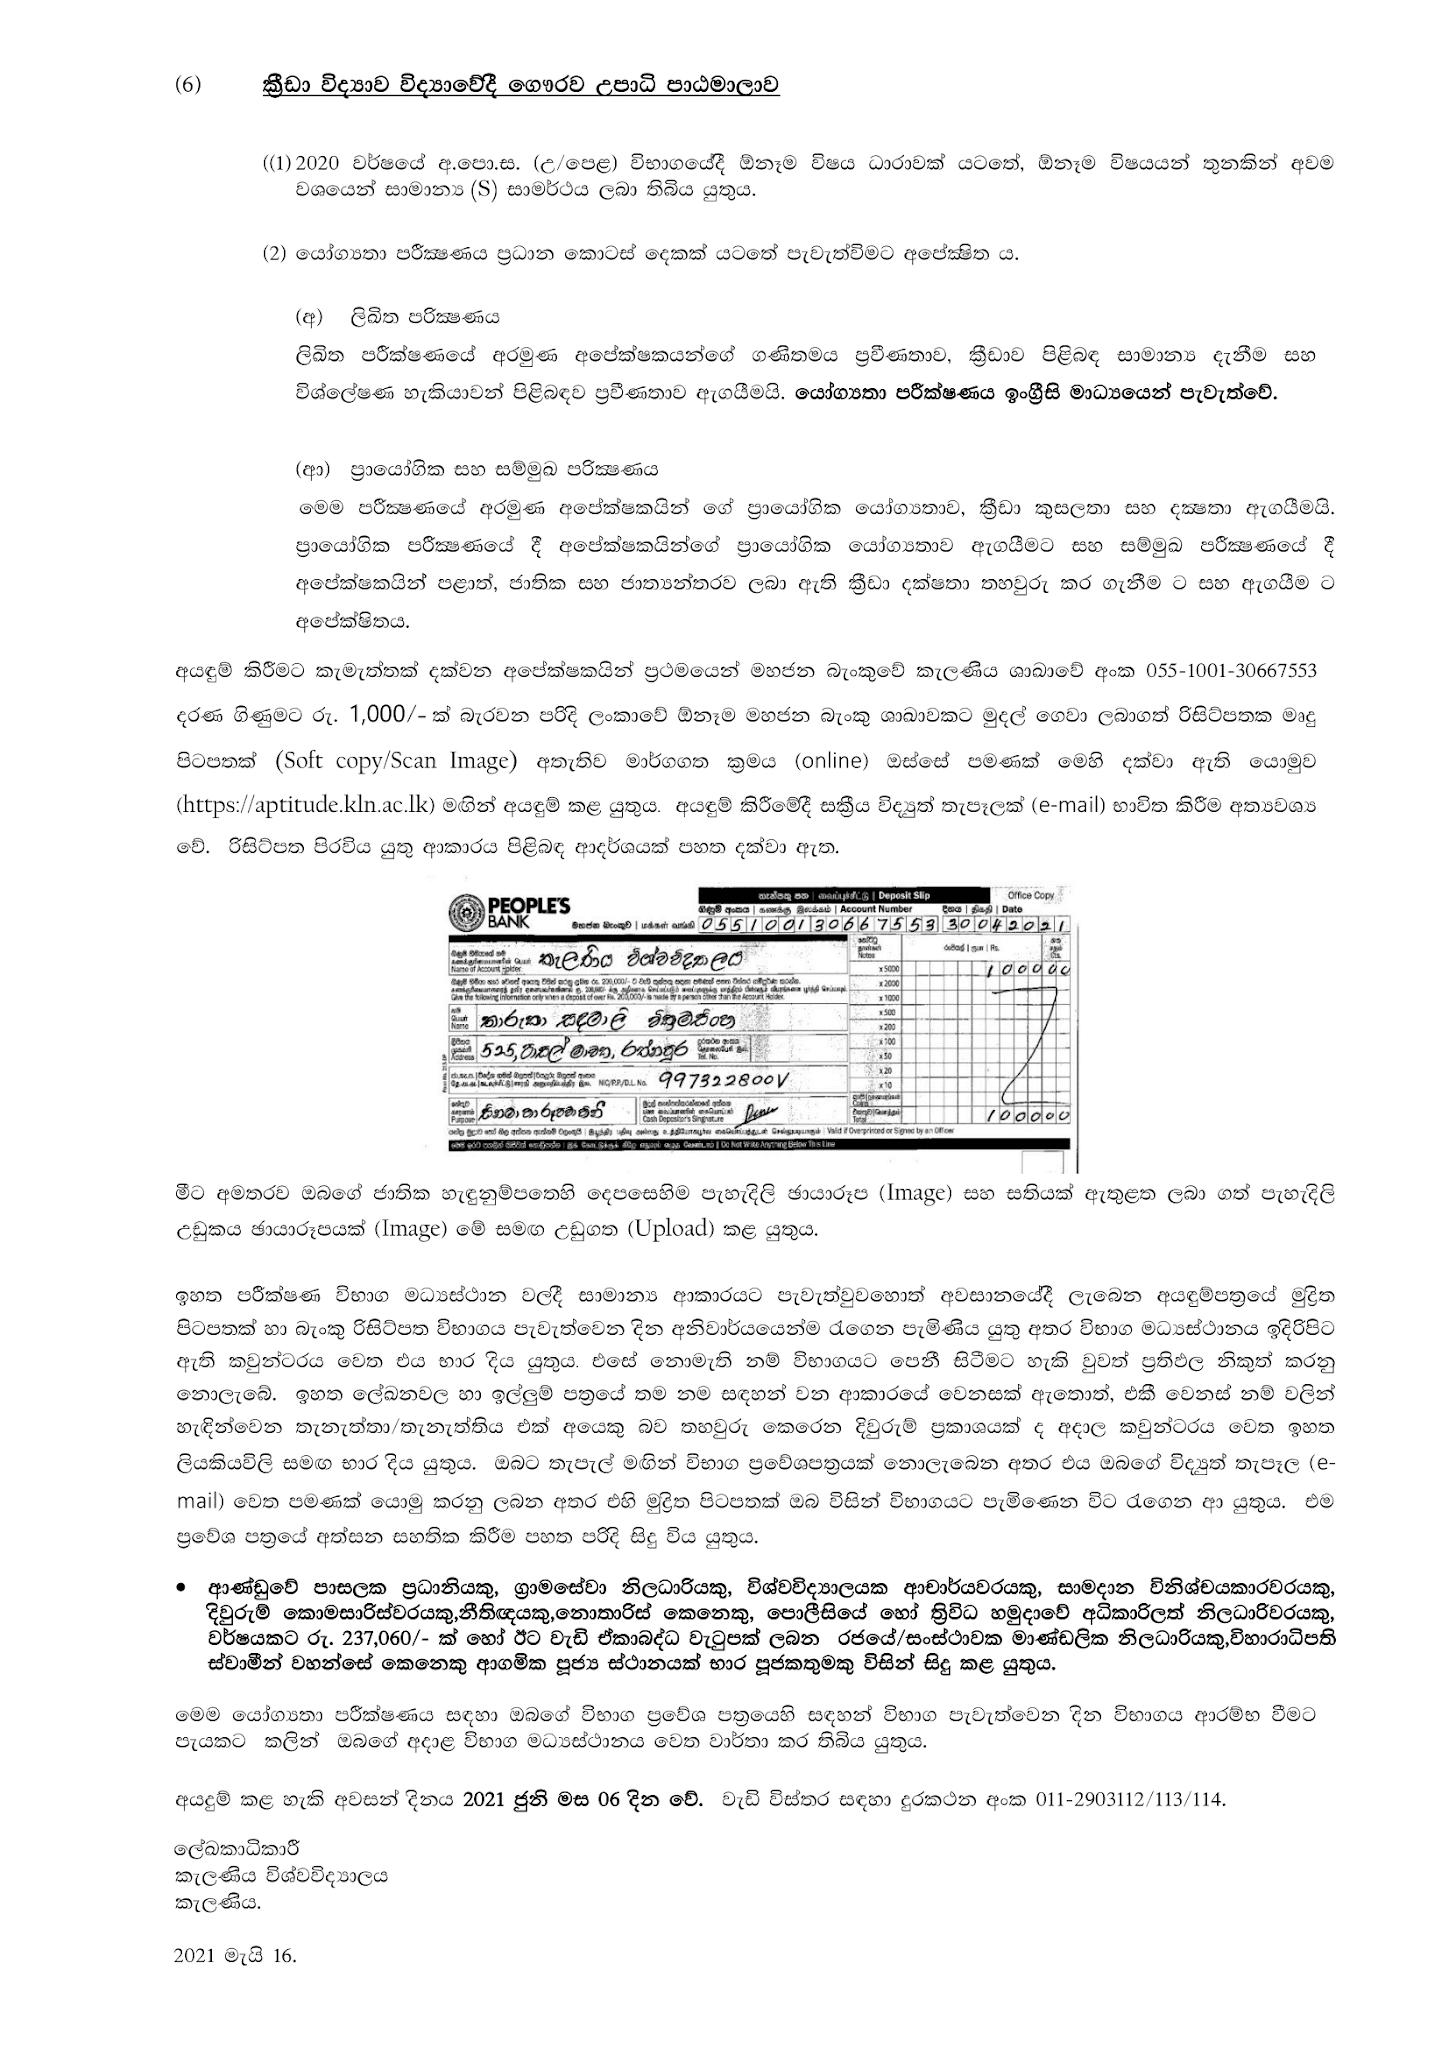 University of Kelaniya Financial Engineering Aptitude Test 2021 Application